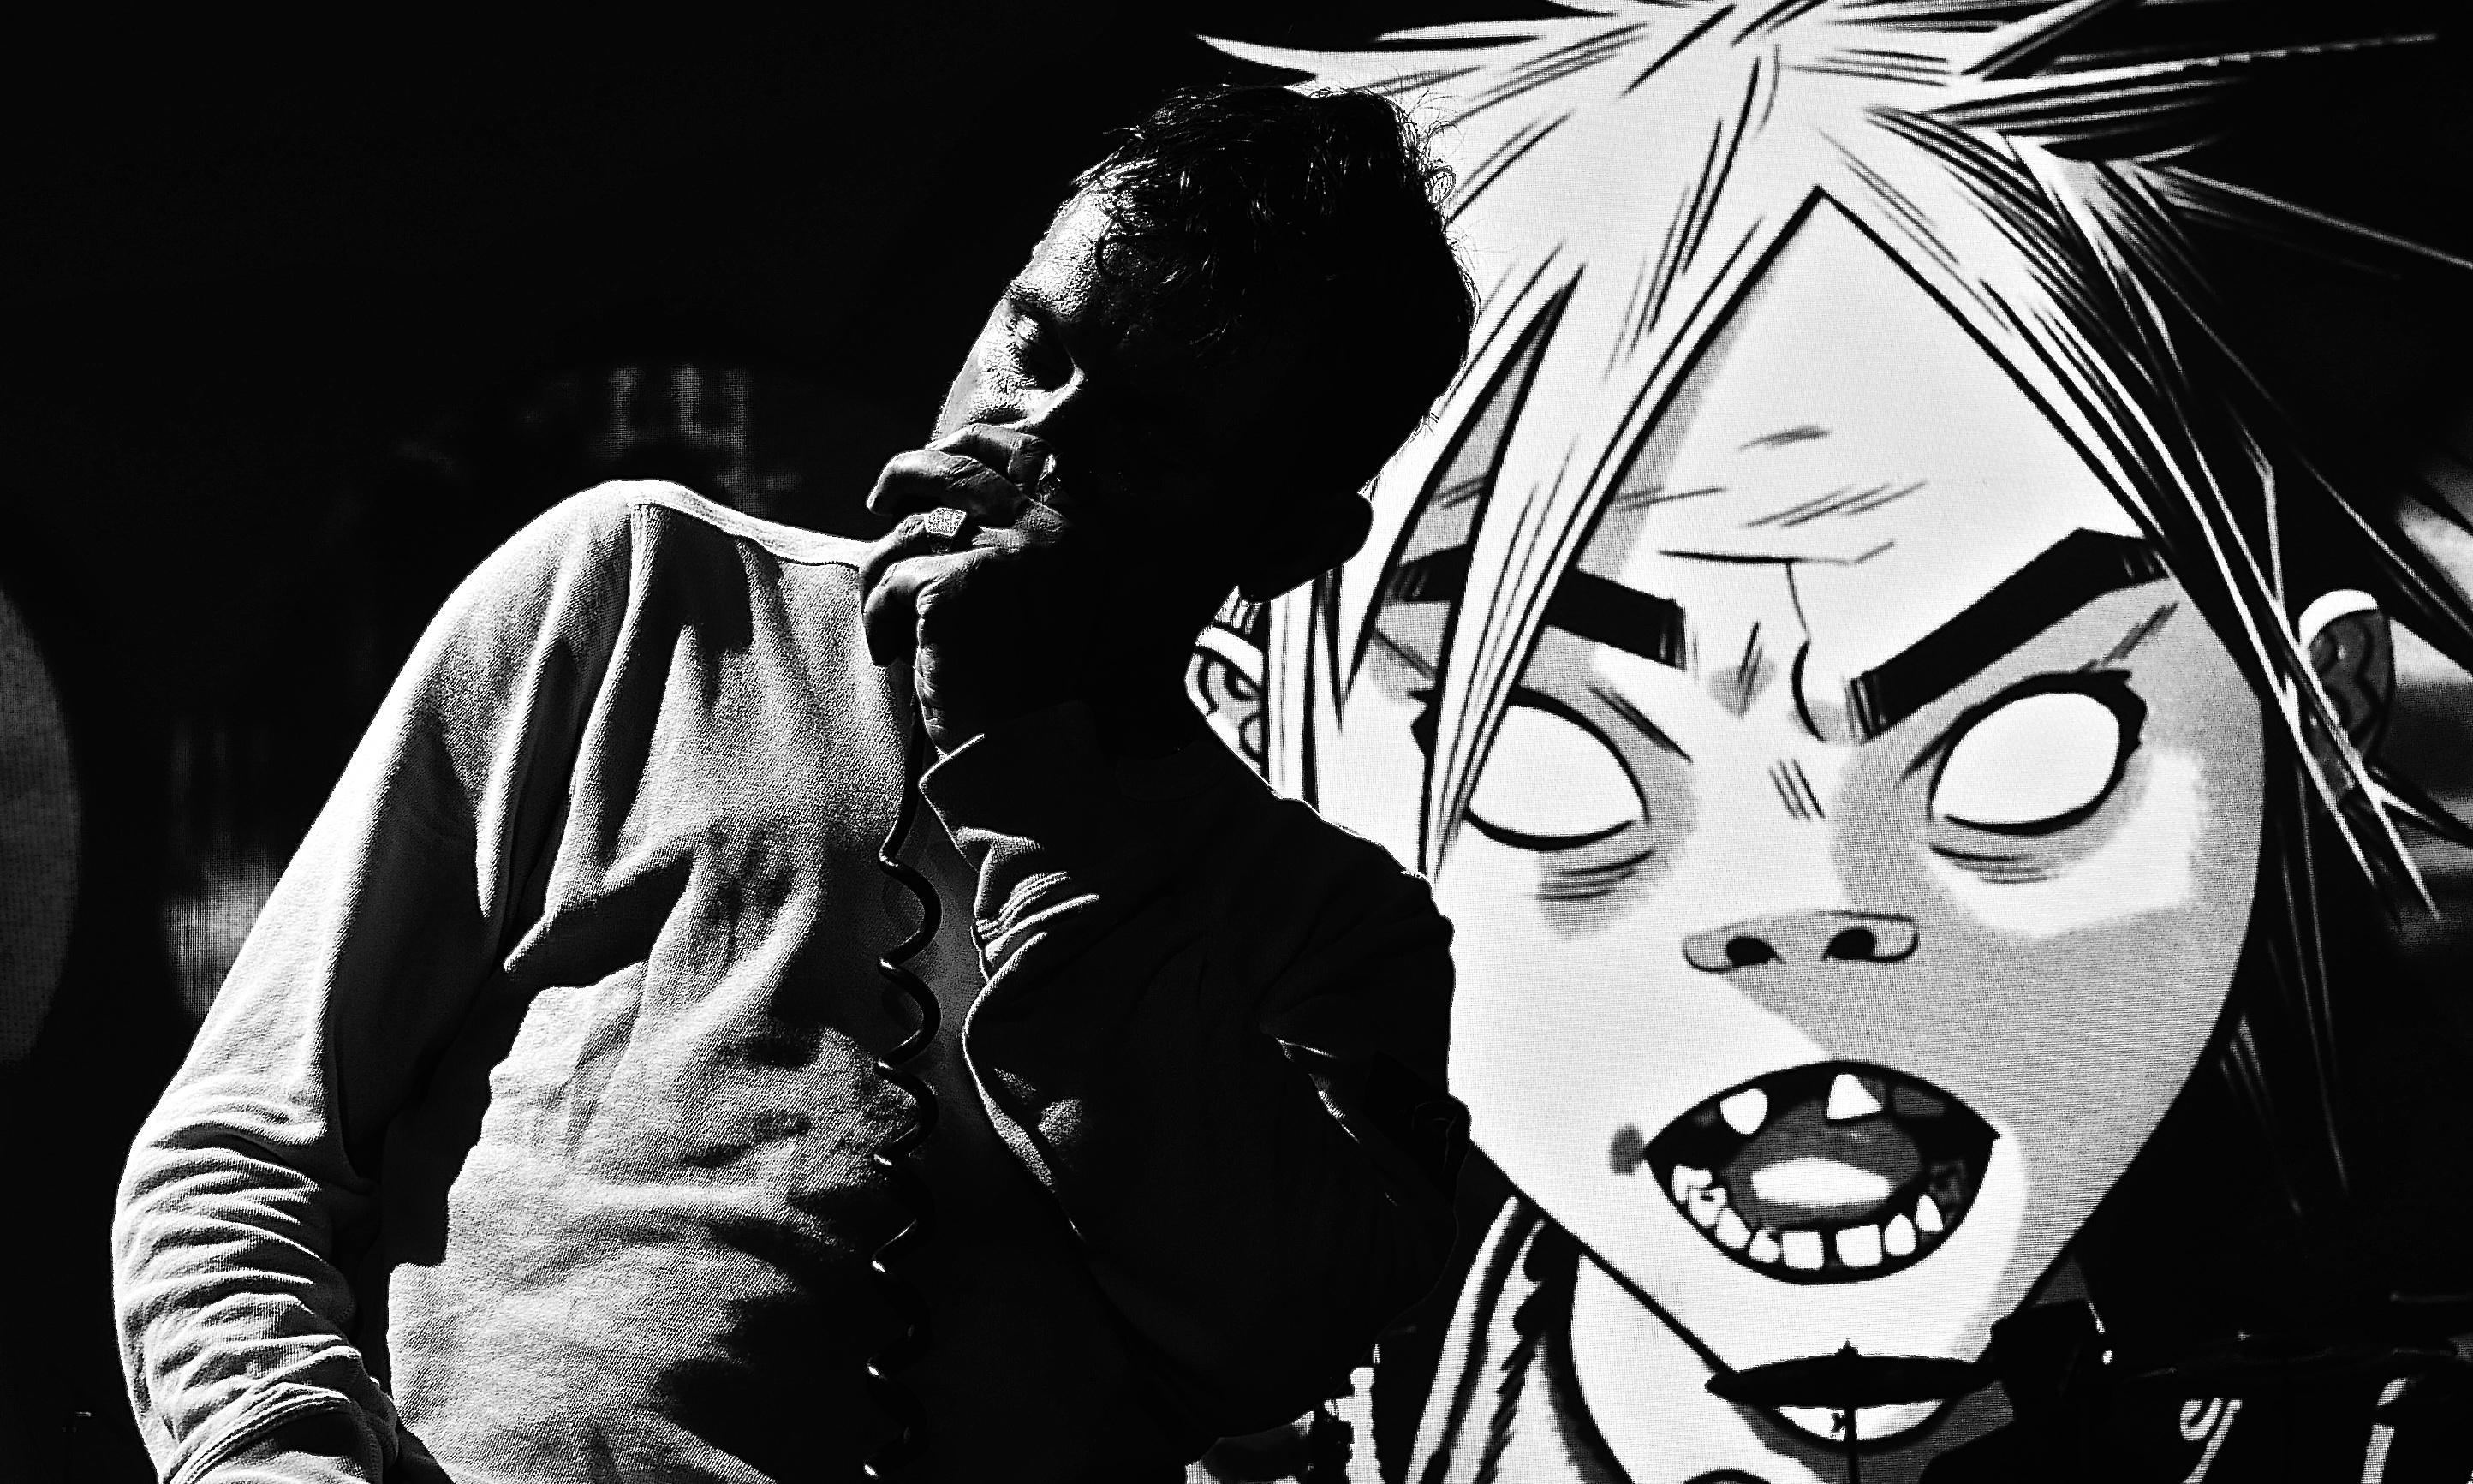 Gorillaz: Reject False Icons review – a swing through Damon Albarn's circus